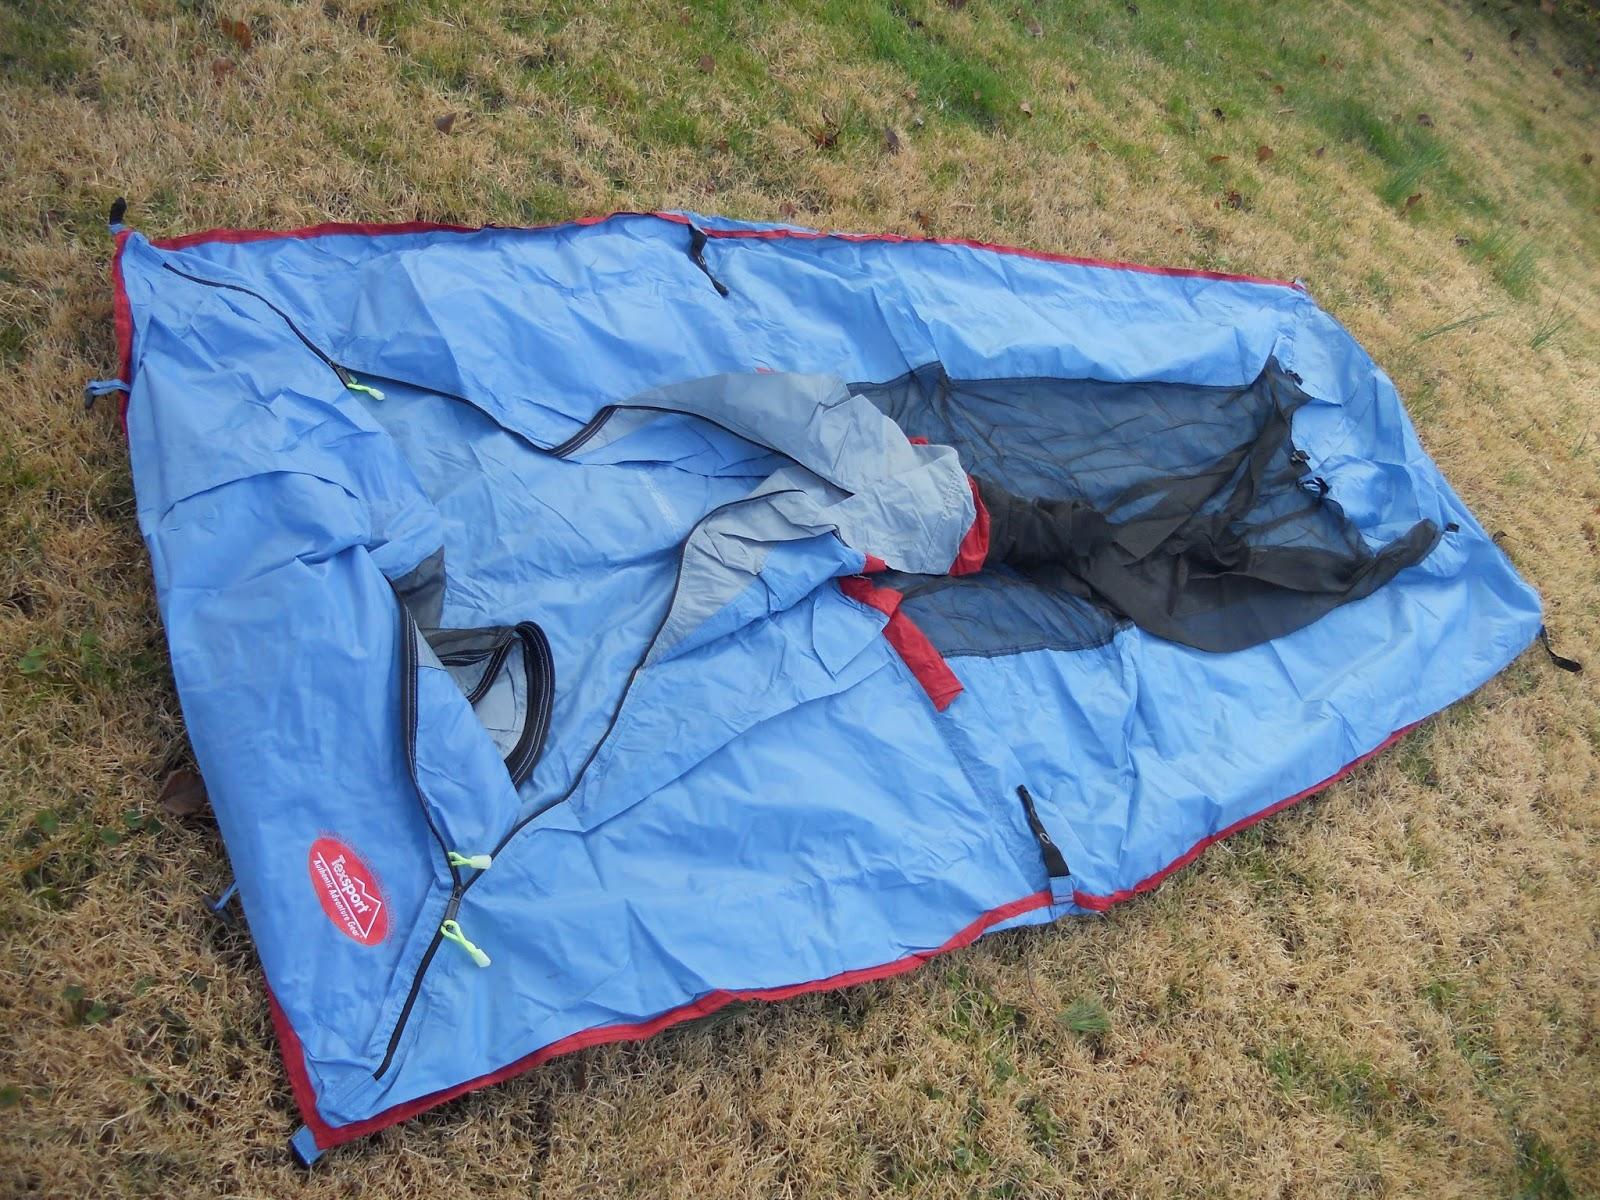 Texsport Saguaro Bivy Shelter Tent Skin Laid Out & Texsport Saguaro Bivy Shelter Tent: Texsport Saguaro Bivy Shelter ...